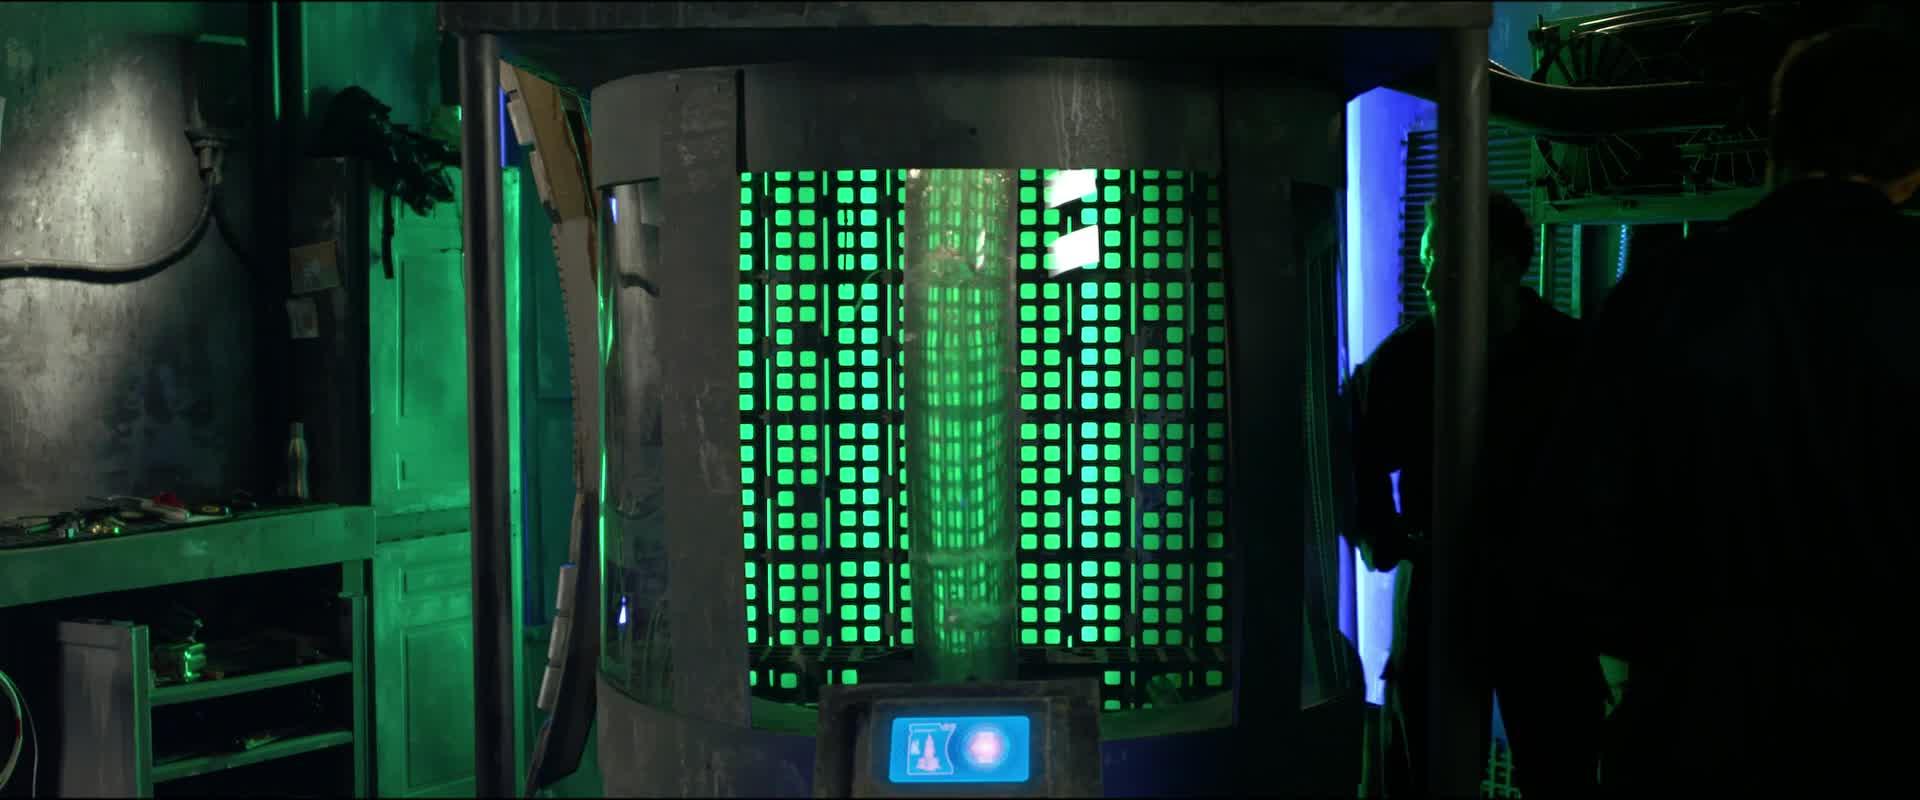 Posledni pruzkum    2017 CZ dabing HD 1080p